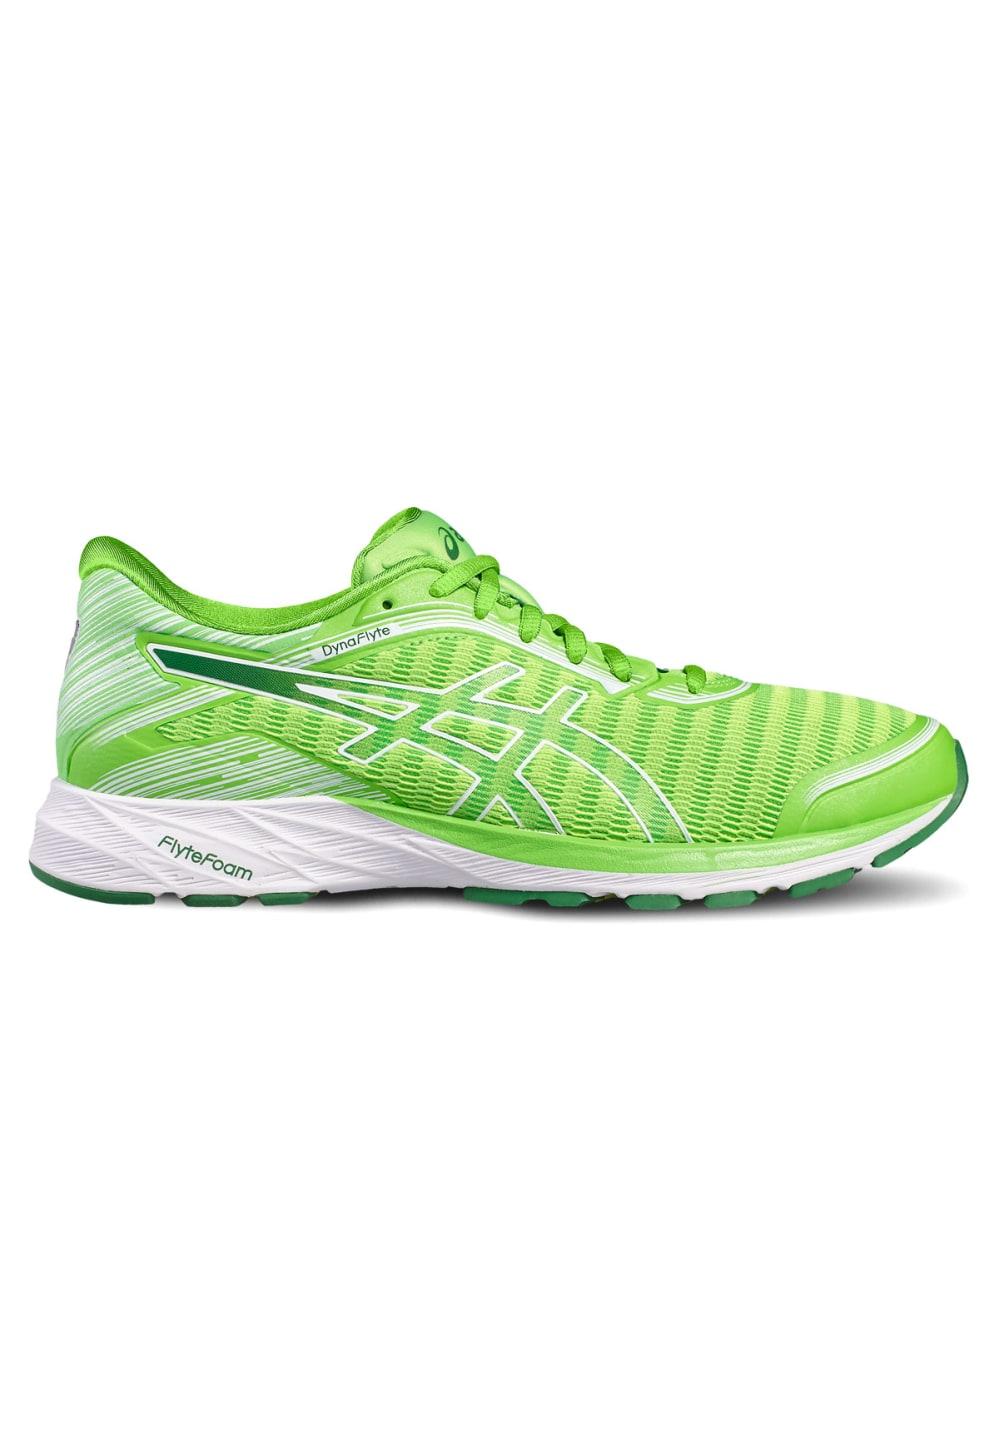 size 40 42577 213ce ASICS DynaFlyte - Running shoes for Men - Green